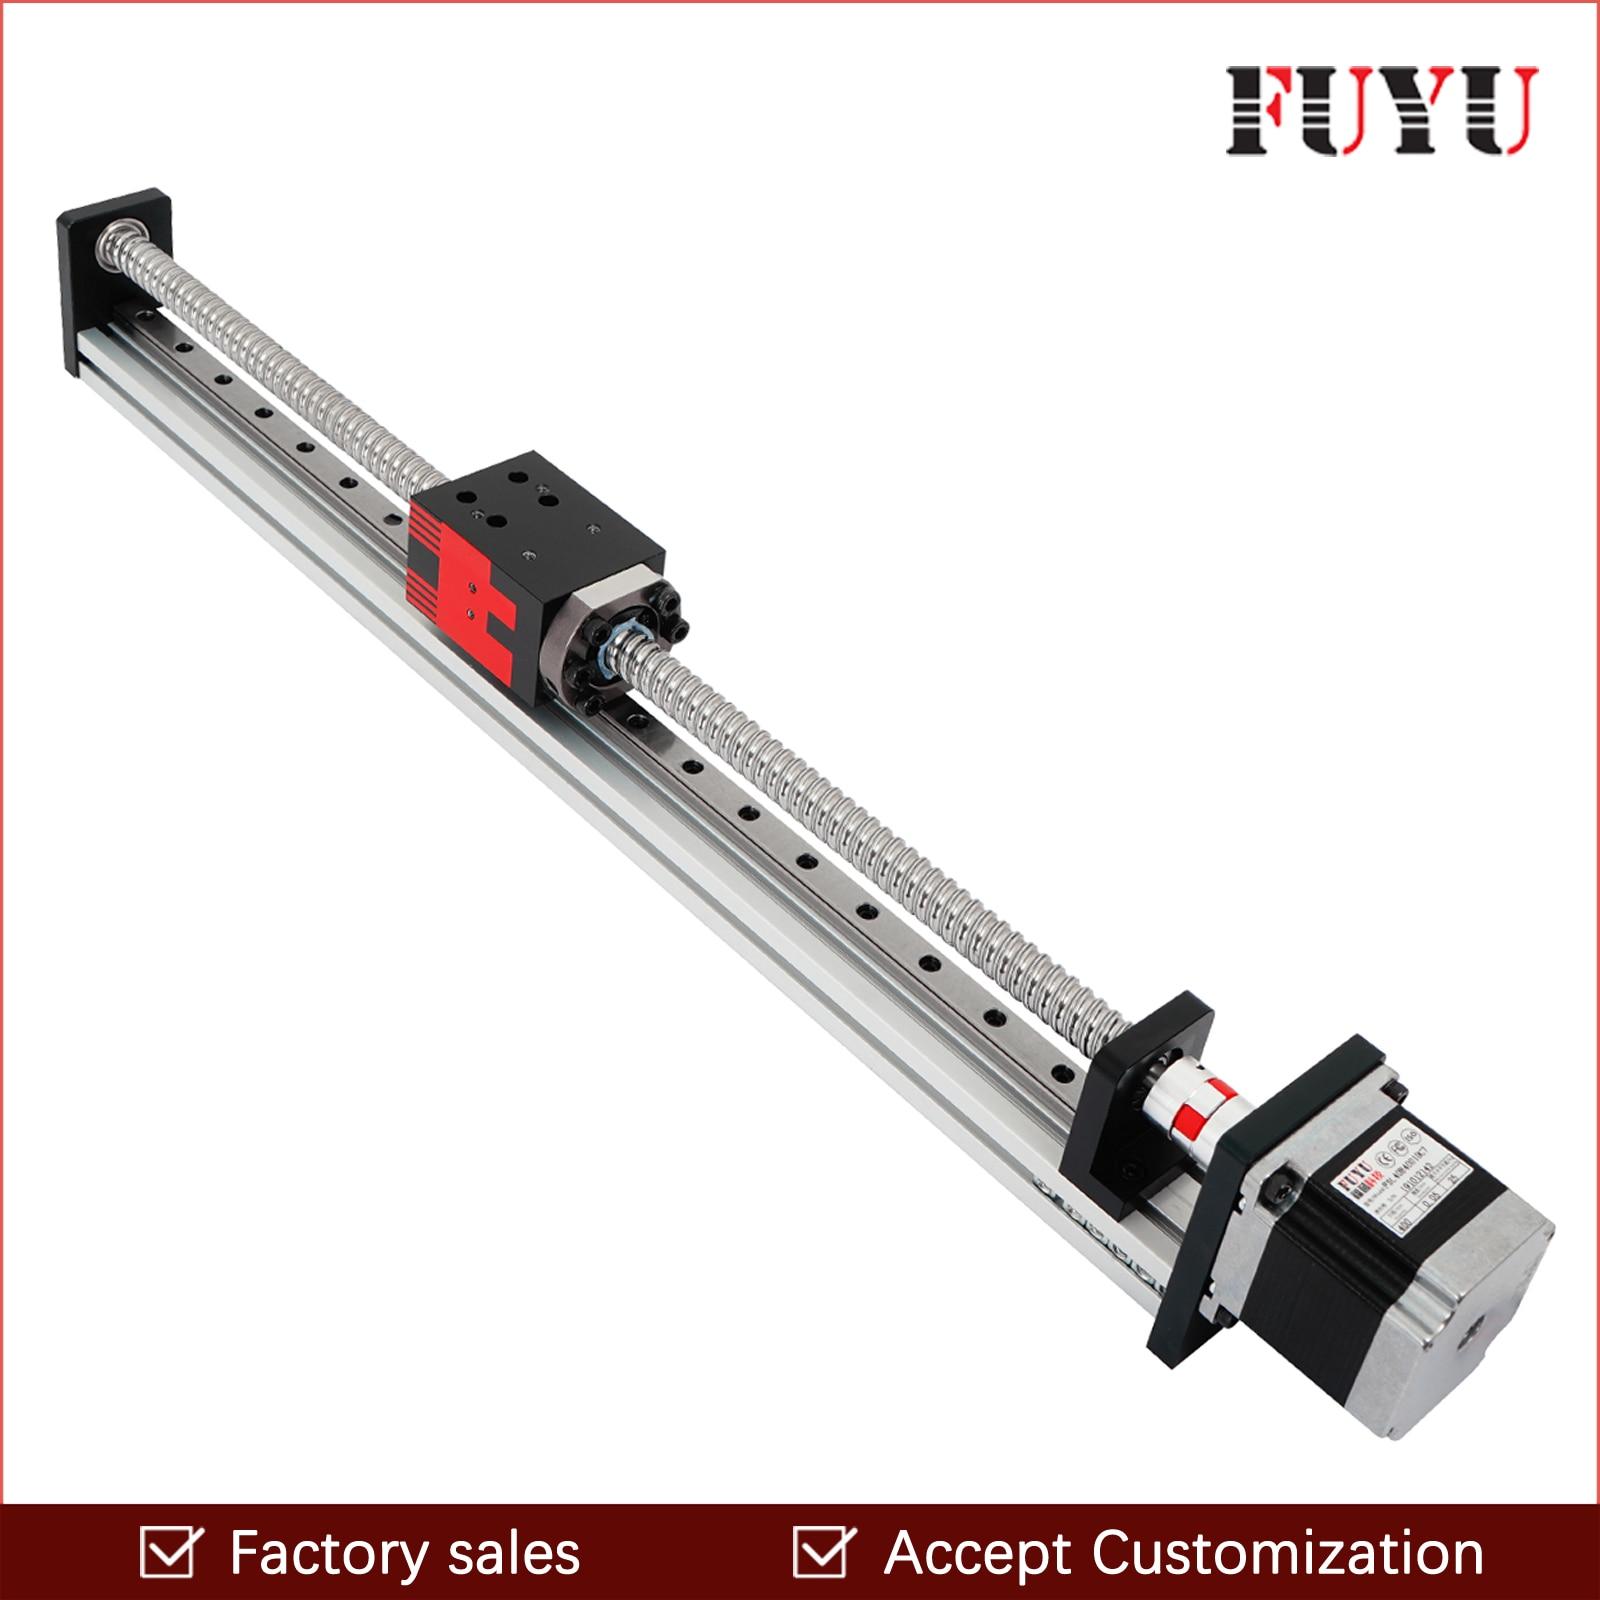 High Speed Belt Linear Guide 400mm Belt Drive CNC Slide Rail Linear Motion Actuator for CNC Machining Laser Machining DIY 3D Printing CNC Milling Machines